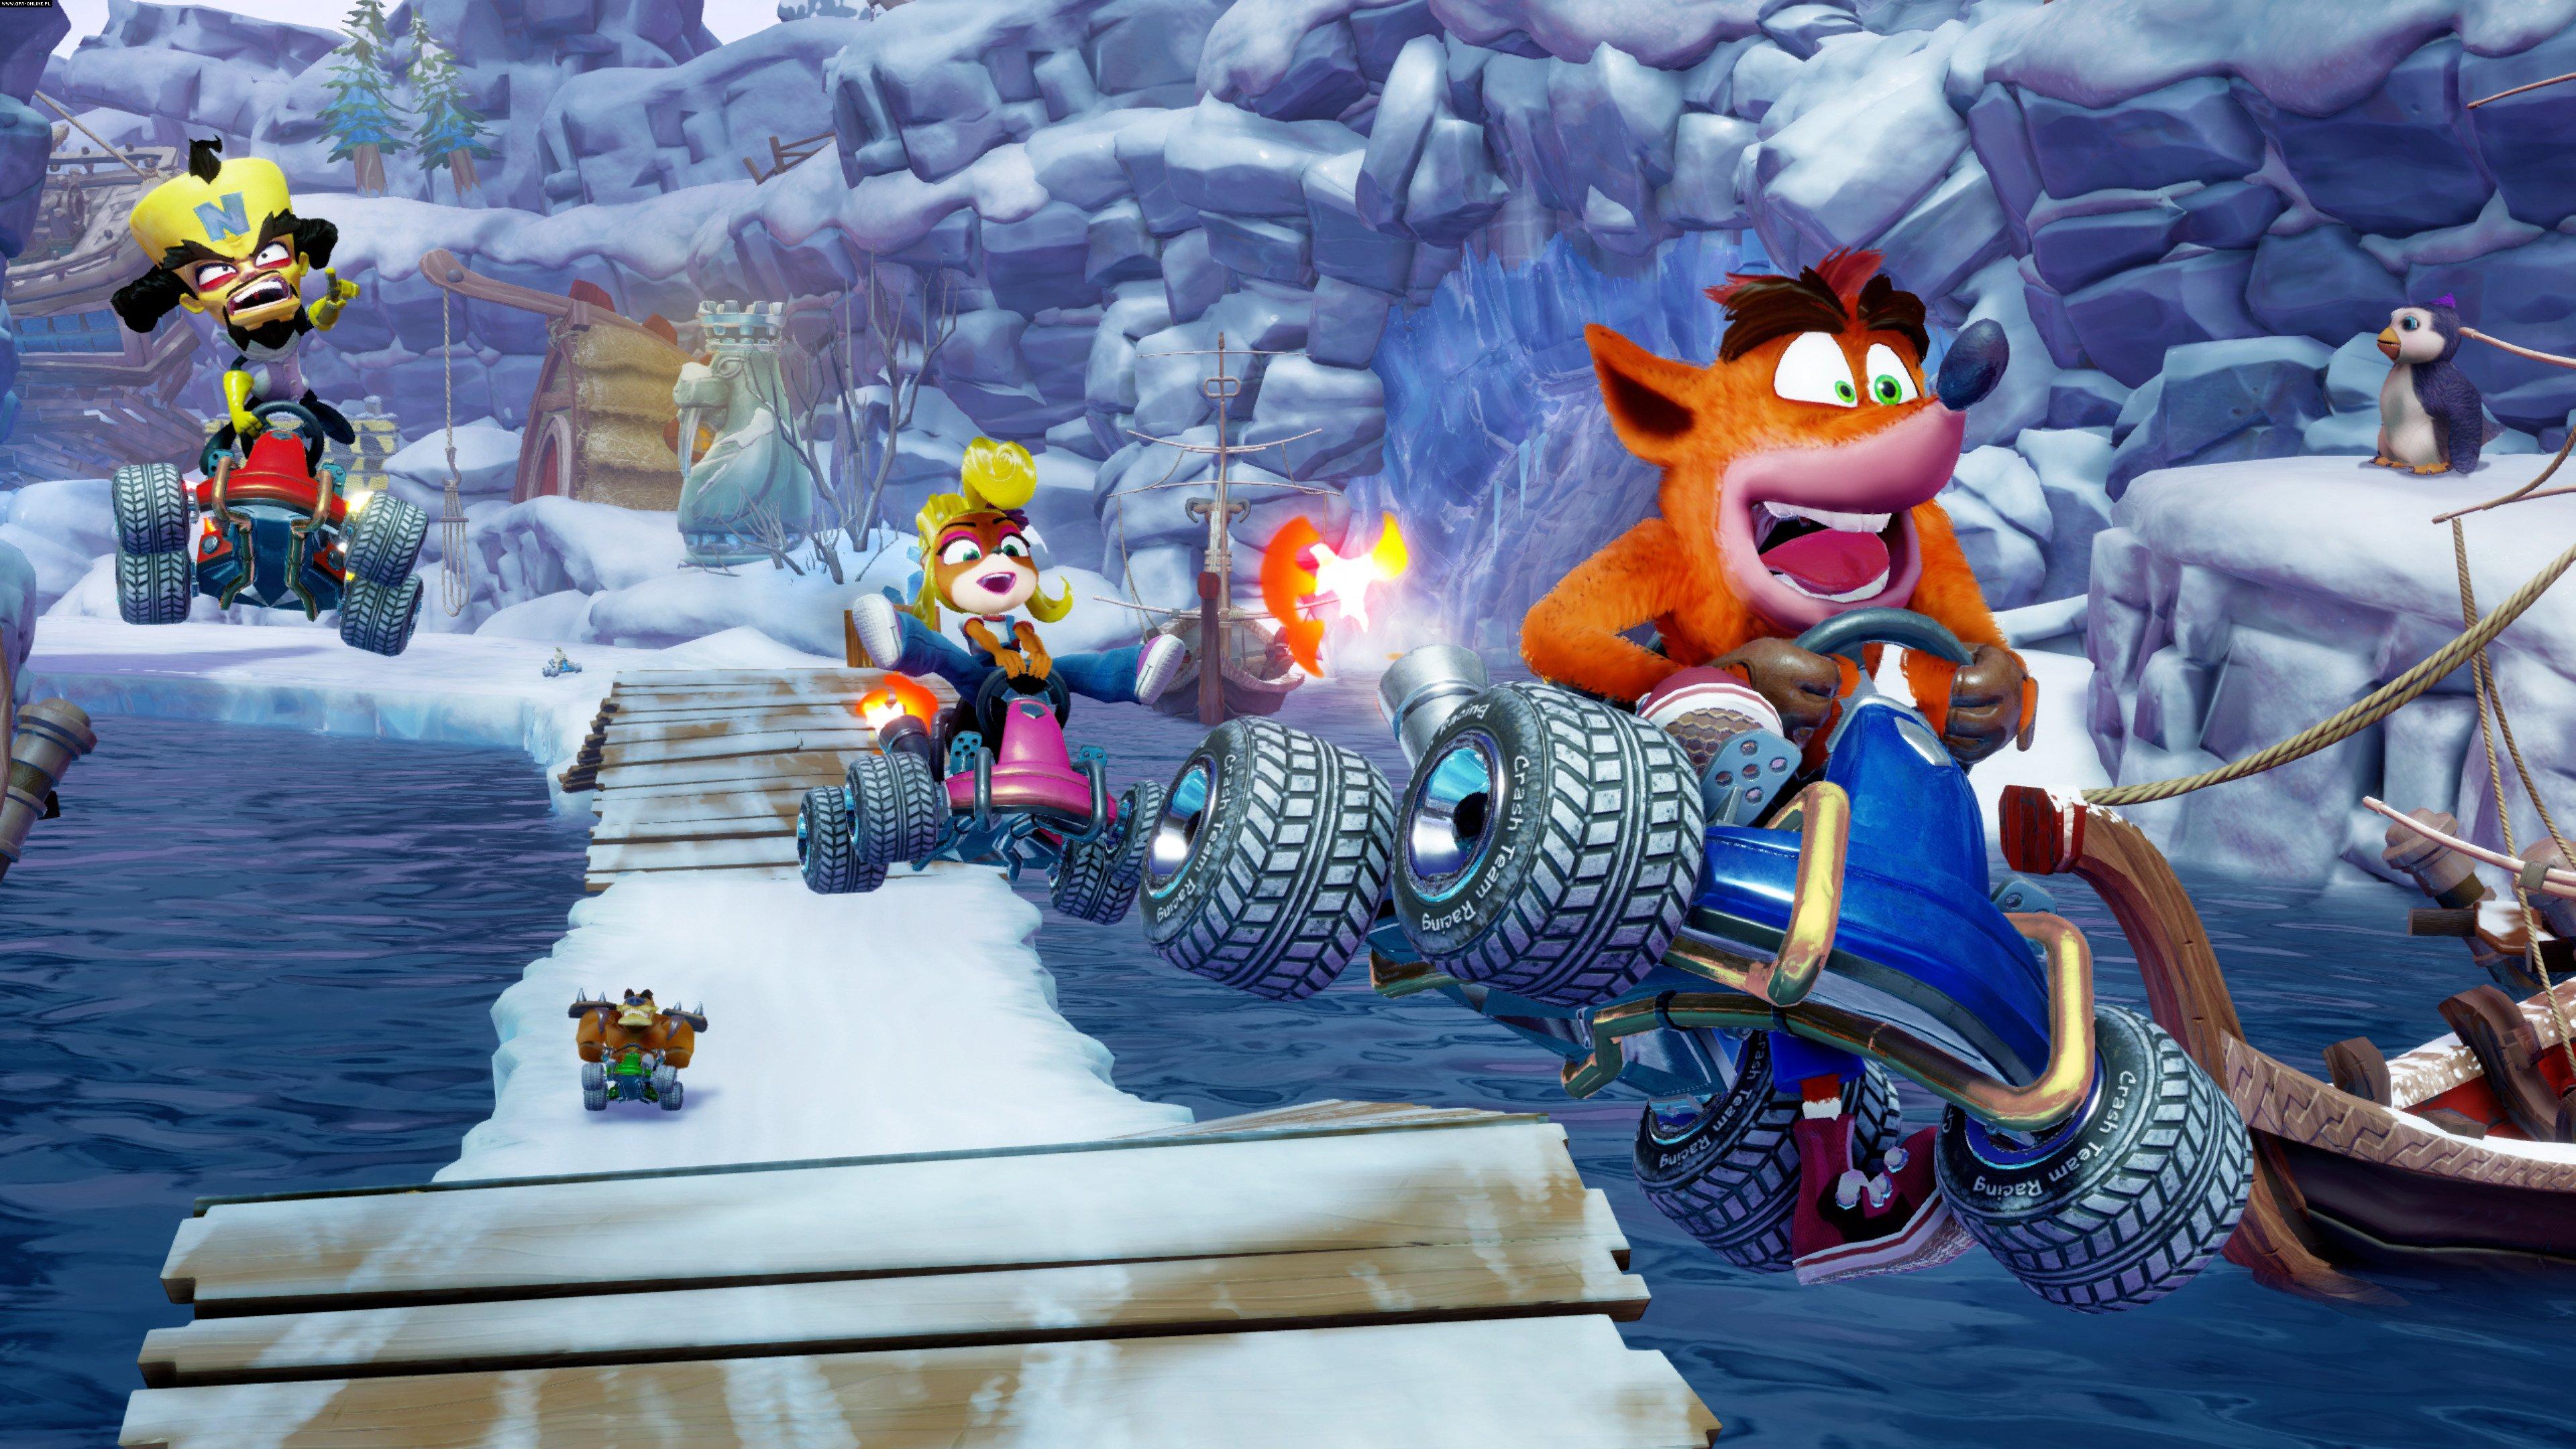 Crash Team Racing Nitro-Fueled PS4 Games Image 24/24, Beenox Inc., Activision Blizzard